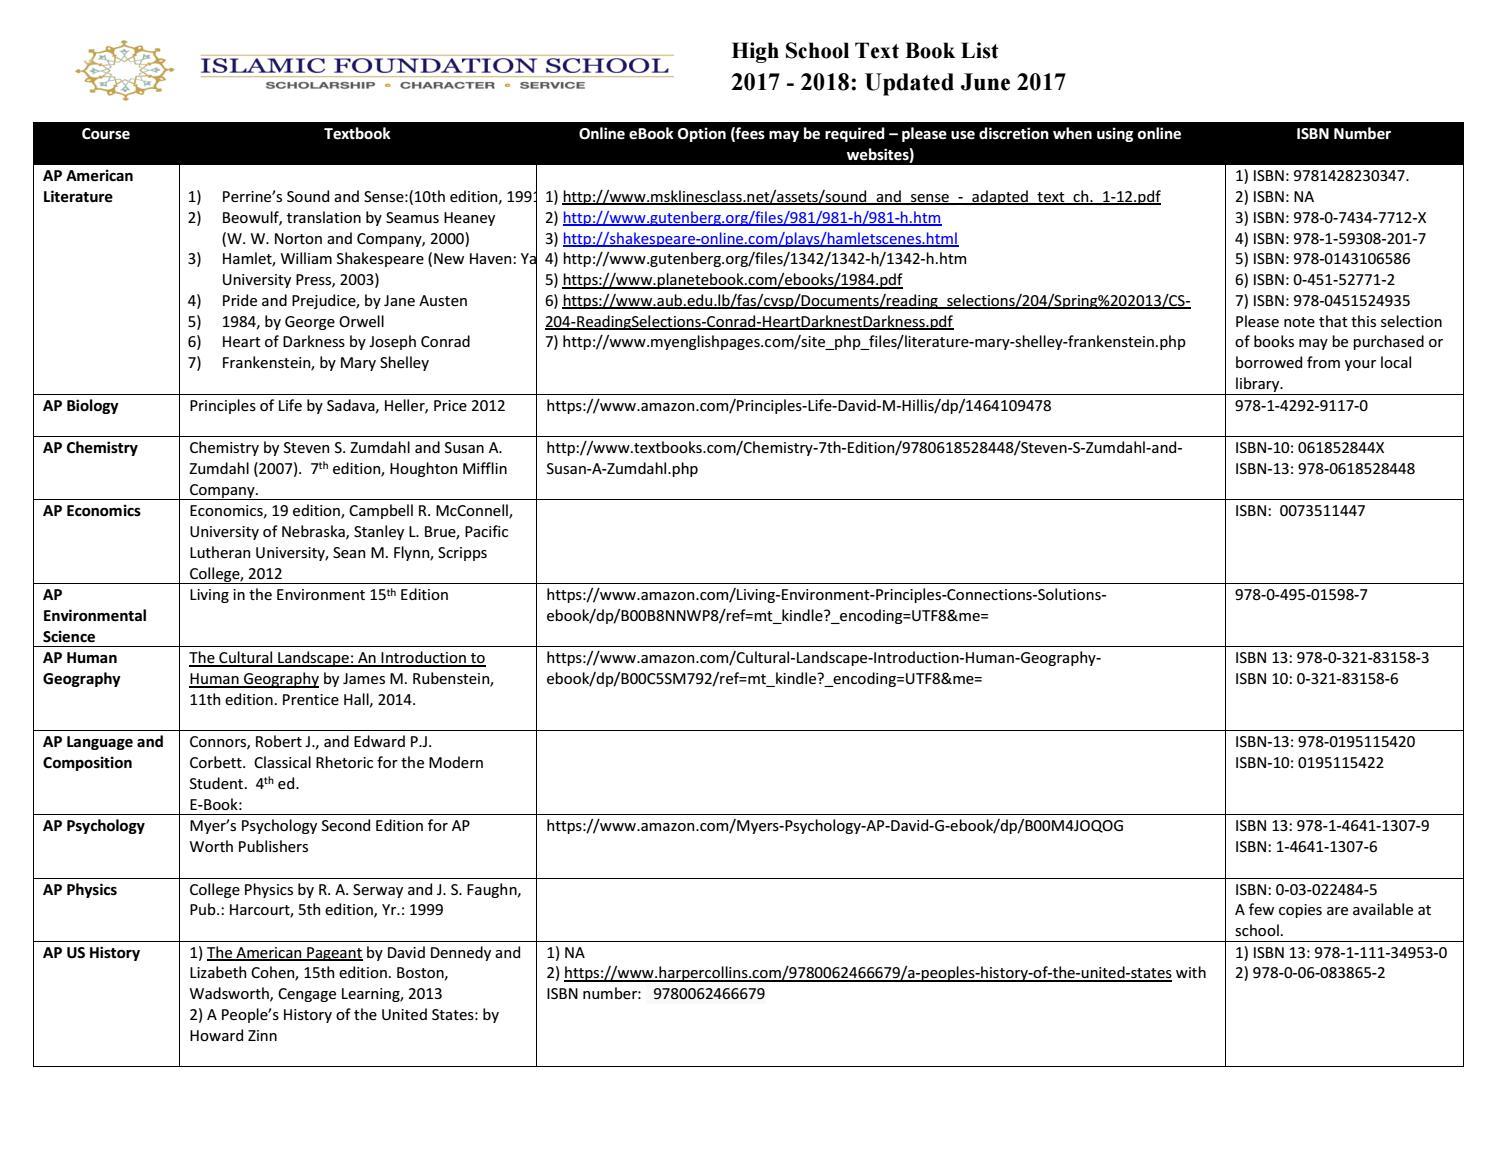 hs-book-list-2017-with-ebooks by Islamic Foundation School Villa ...